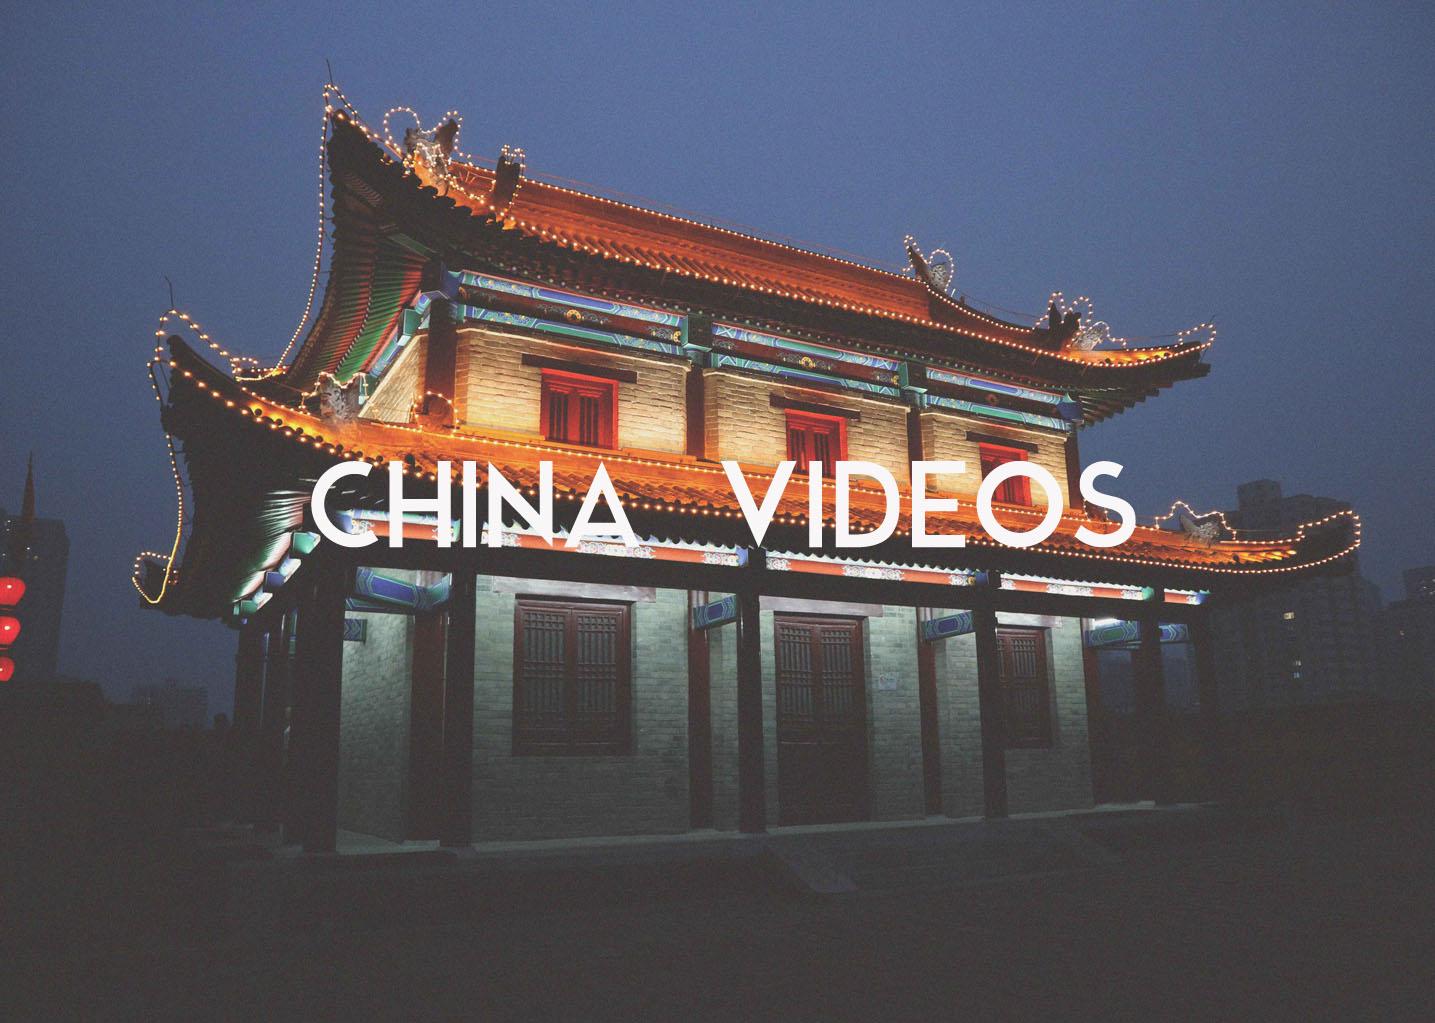 China videos.jpg